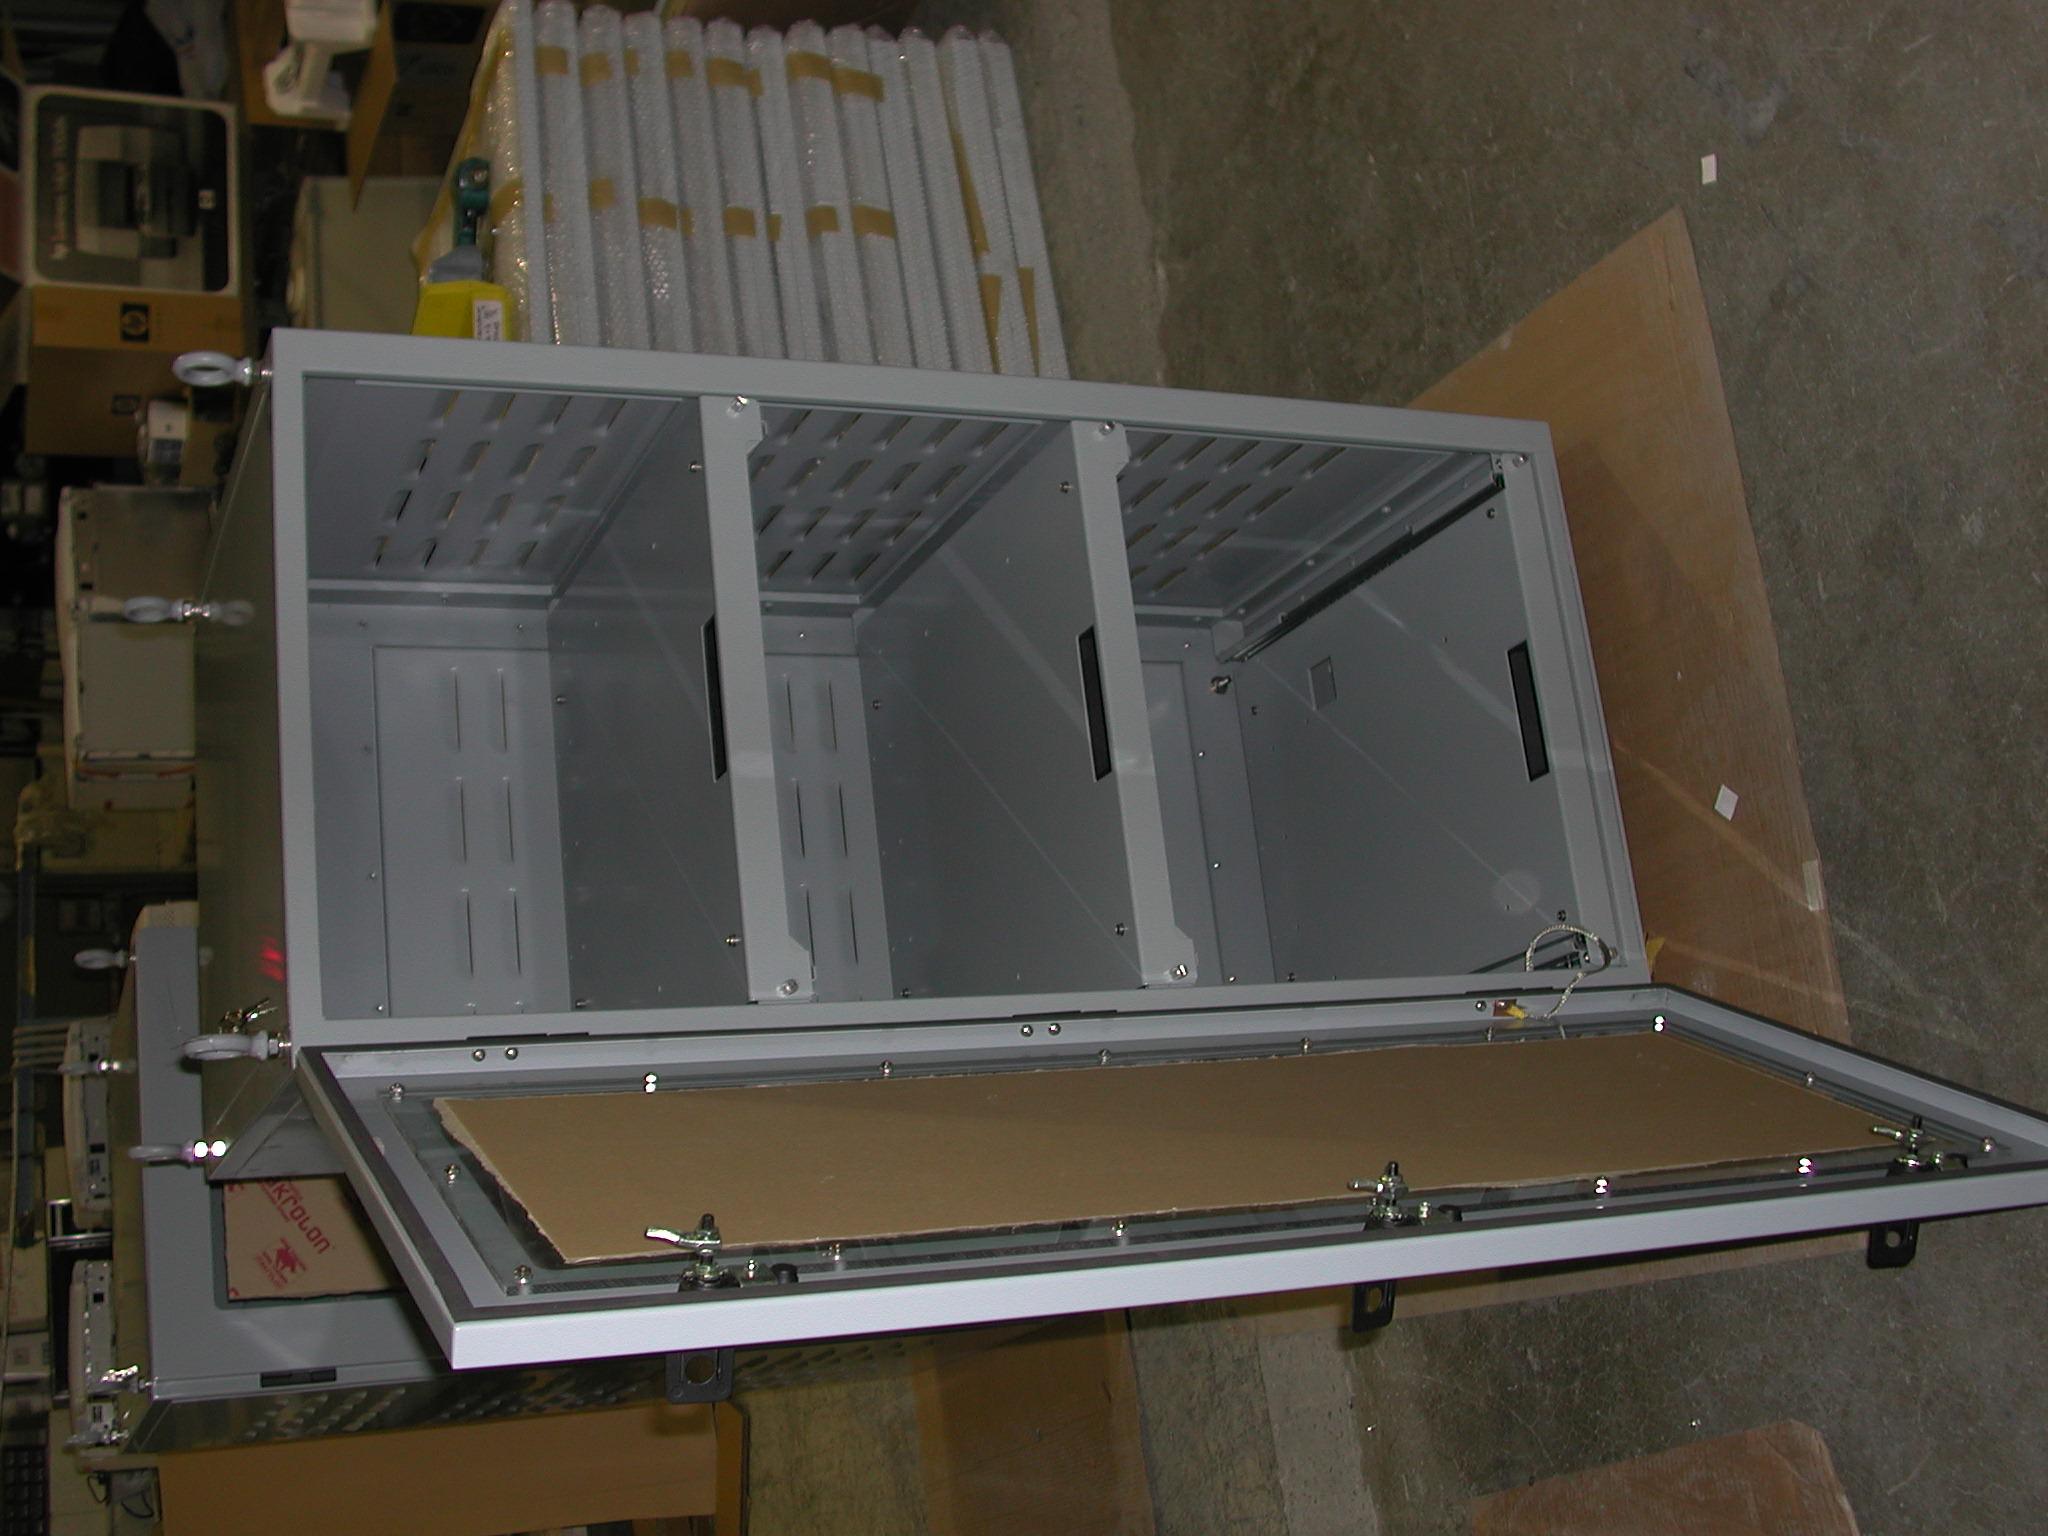 Metal Enclosures Millitary Hopewell Precision NY DSCN1629.JPG